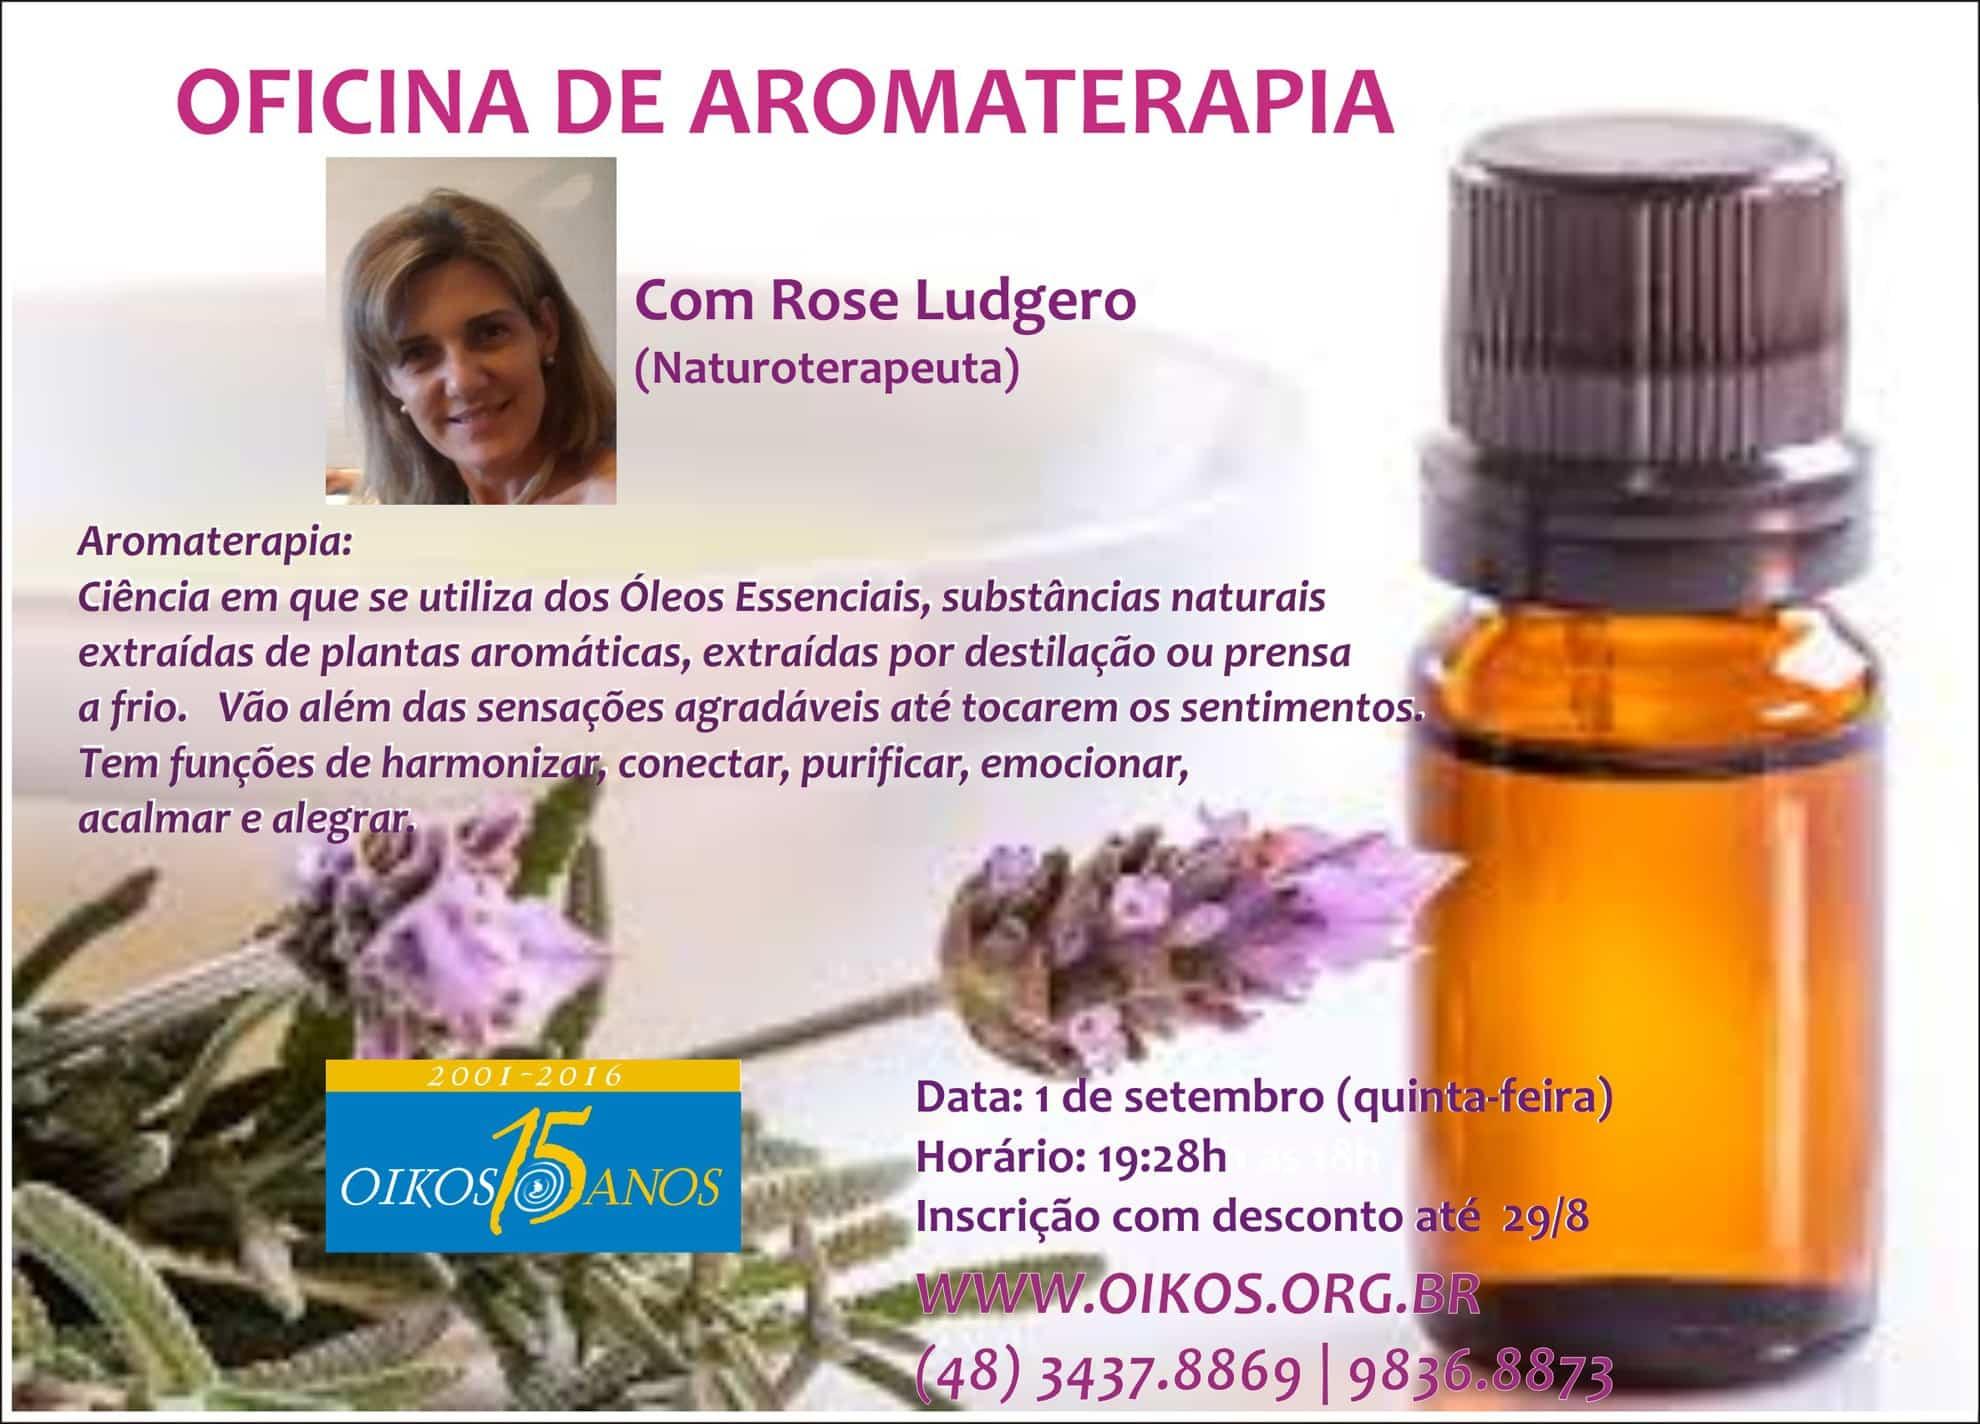 Oficina de aromaterapia